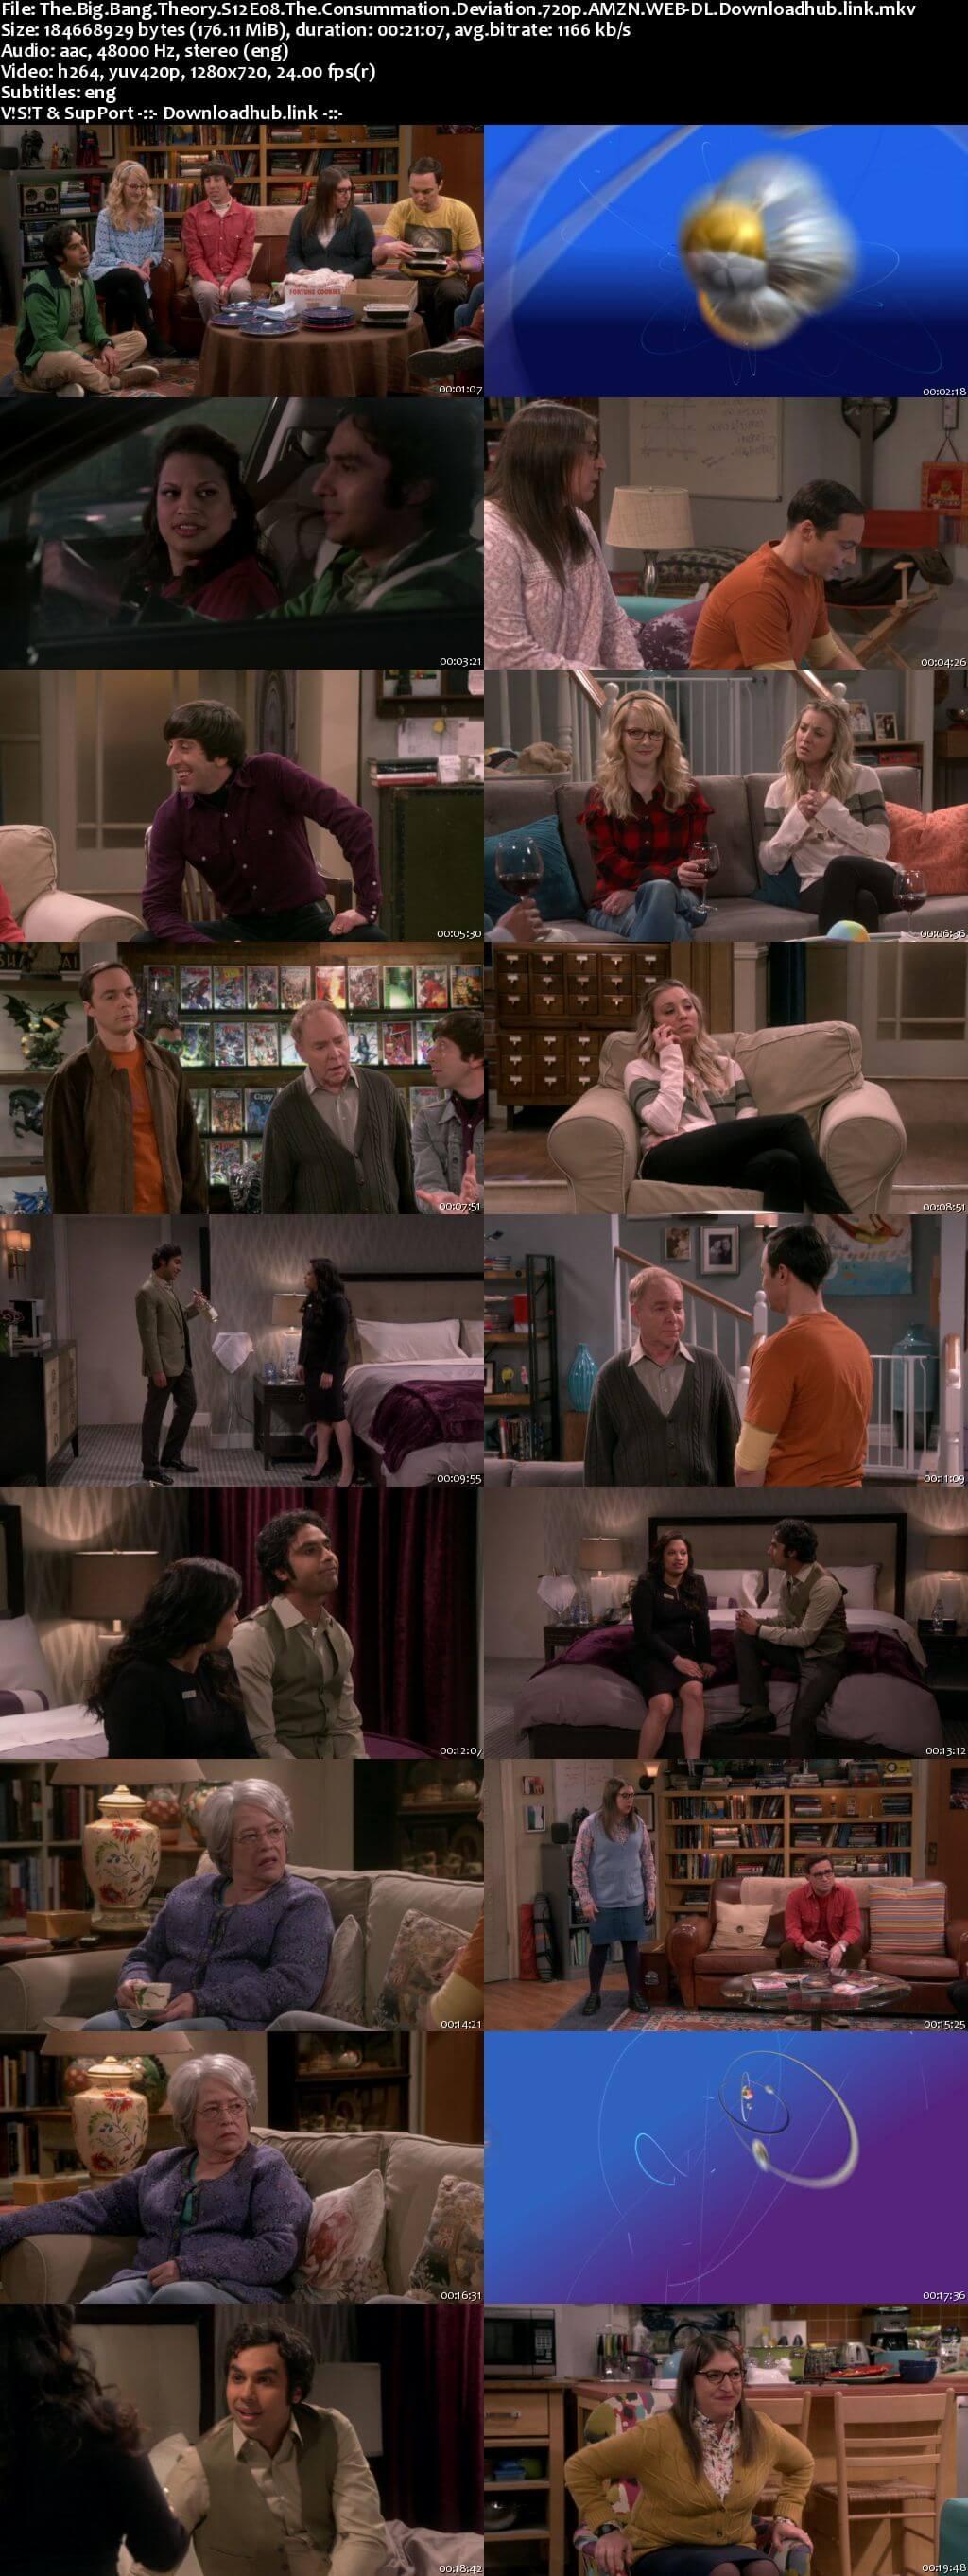 The Big Bang Theory S12E08 170MB AMZN WEB-DL 720p ESubs